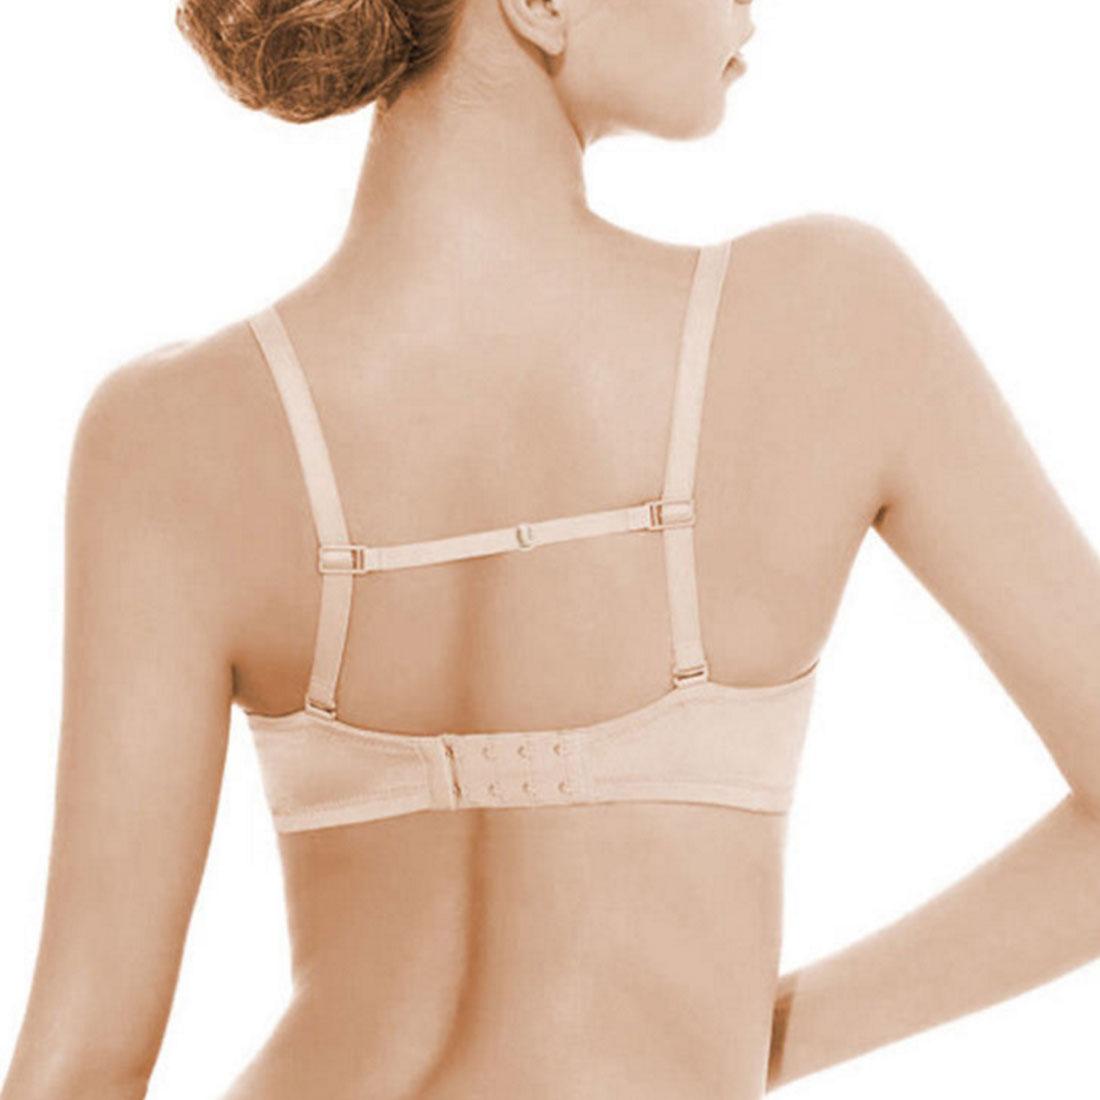 Lot 2PC Double-shoulder Strap Belt Bra With Back Hasp non-slip Black/White/Beige Anti-slip Anti-slip Shoulder Straps